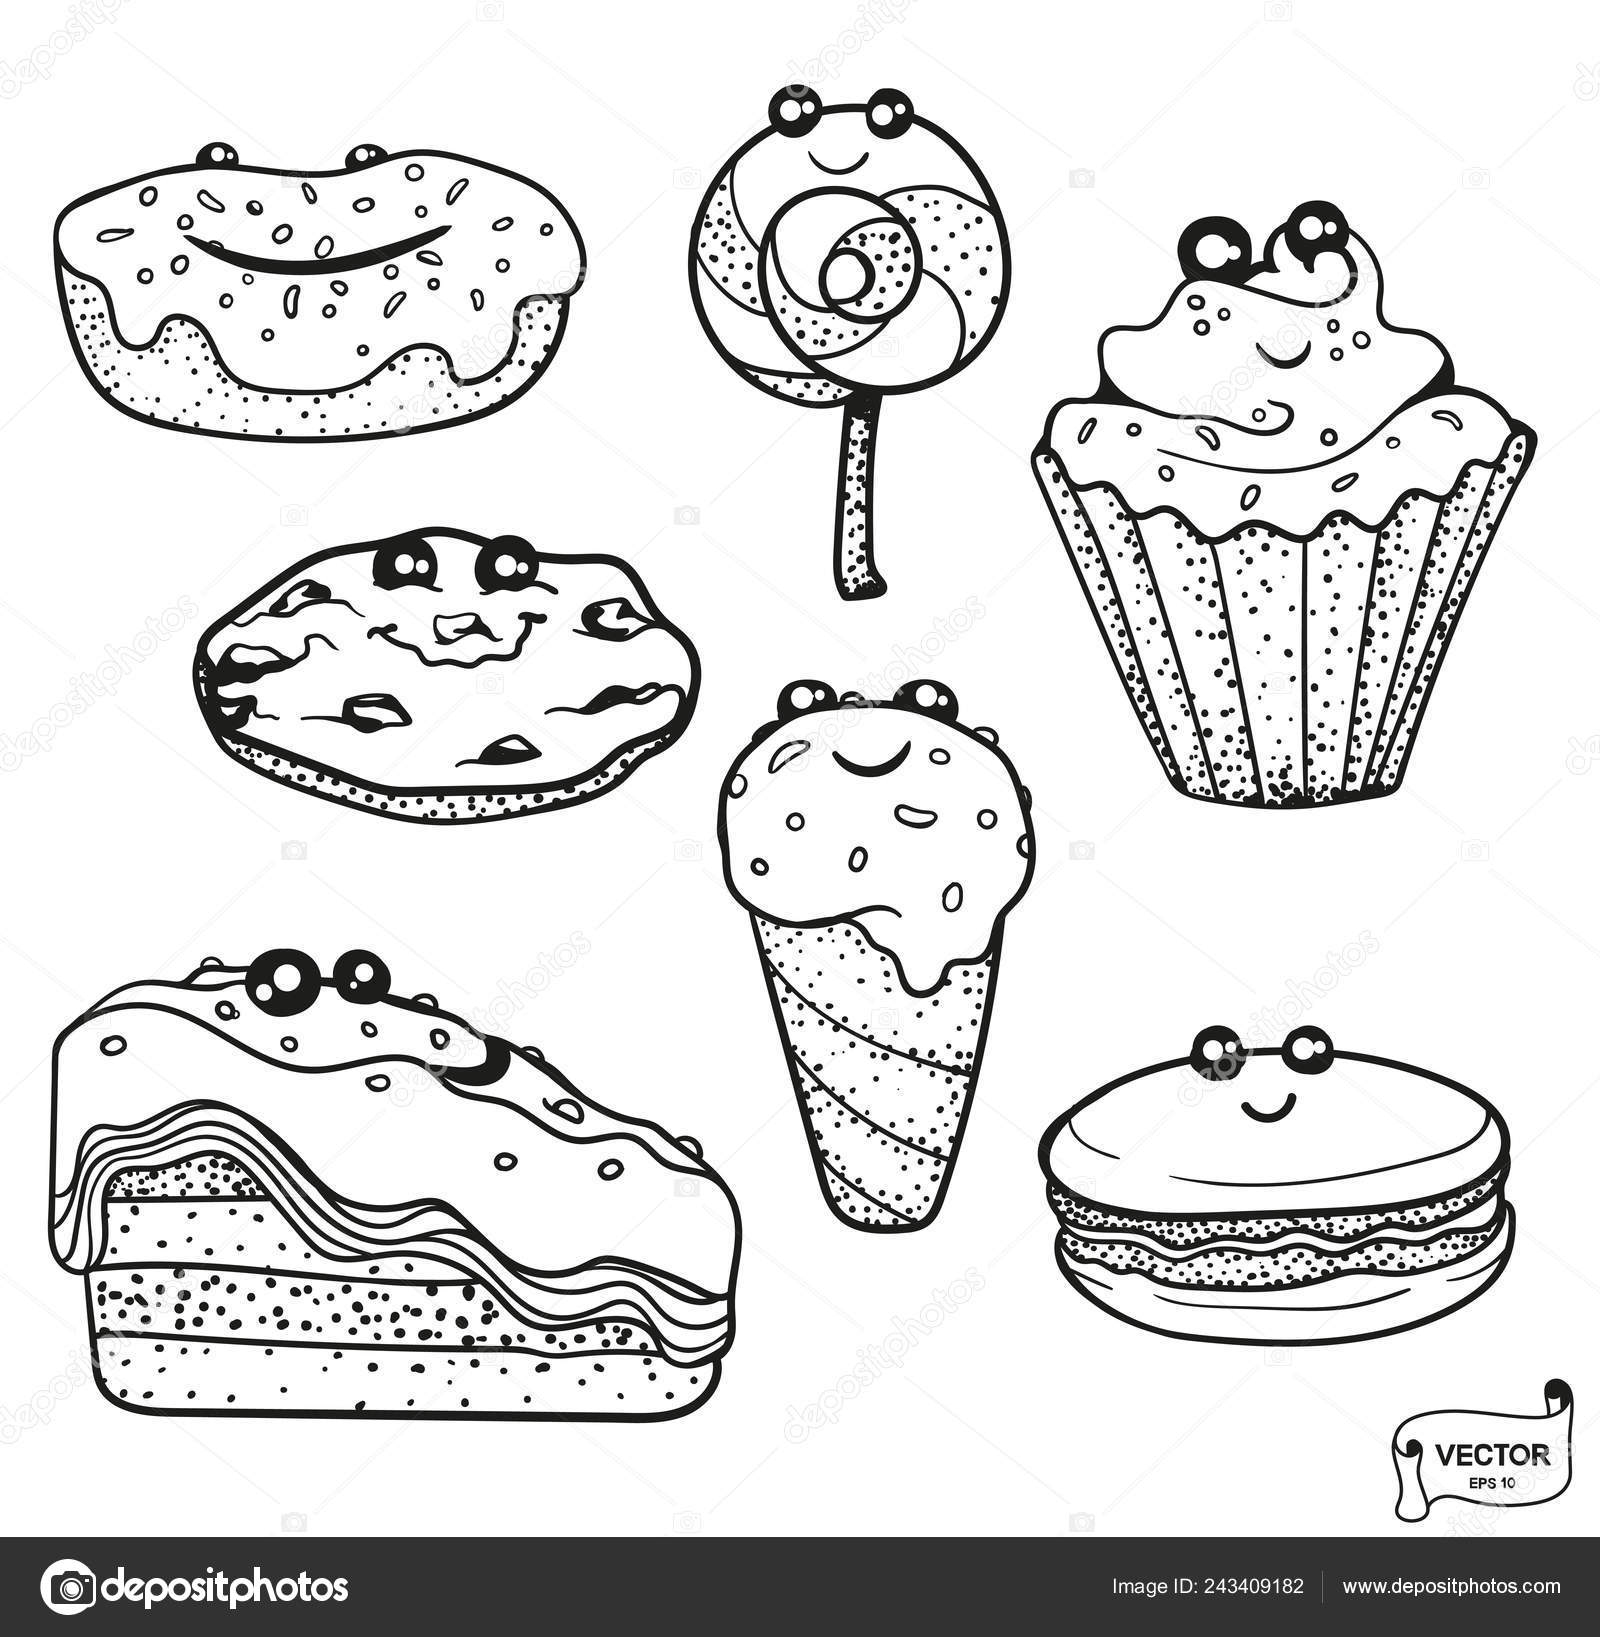 Vector Image Set Cute Cartoon Characters Smiling Kawaii Dessert